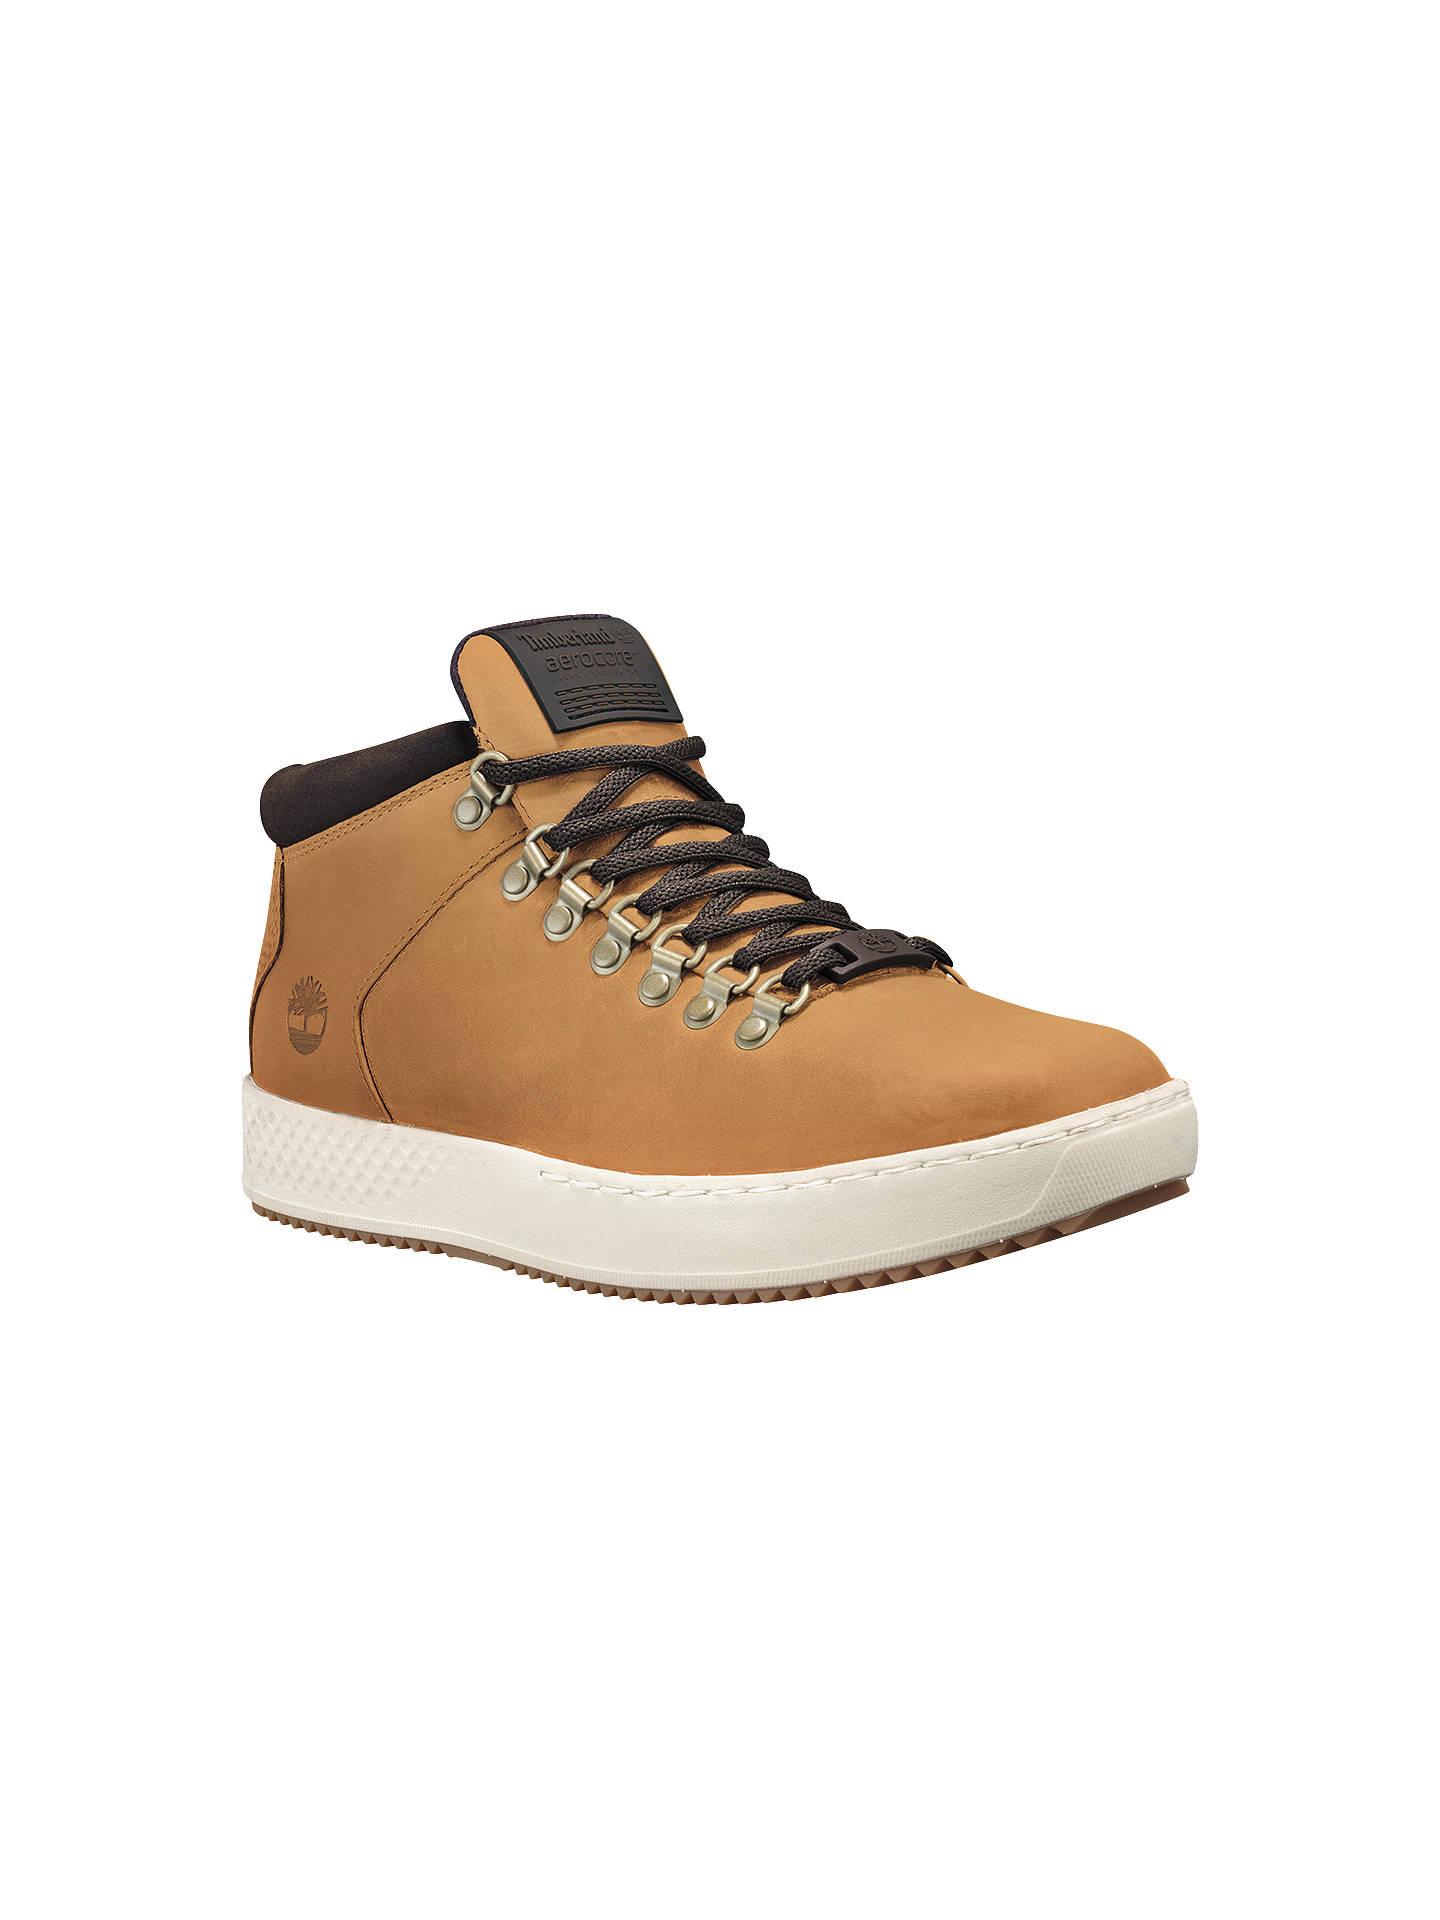 9a14898760d Buy Timberland CityRoam Chukka Boots